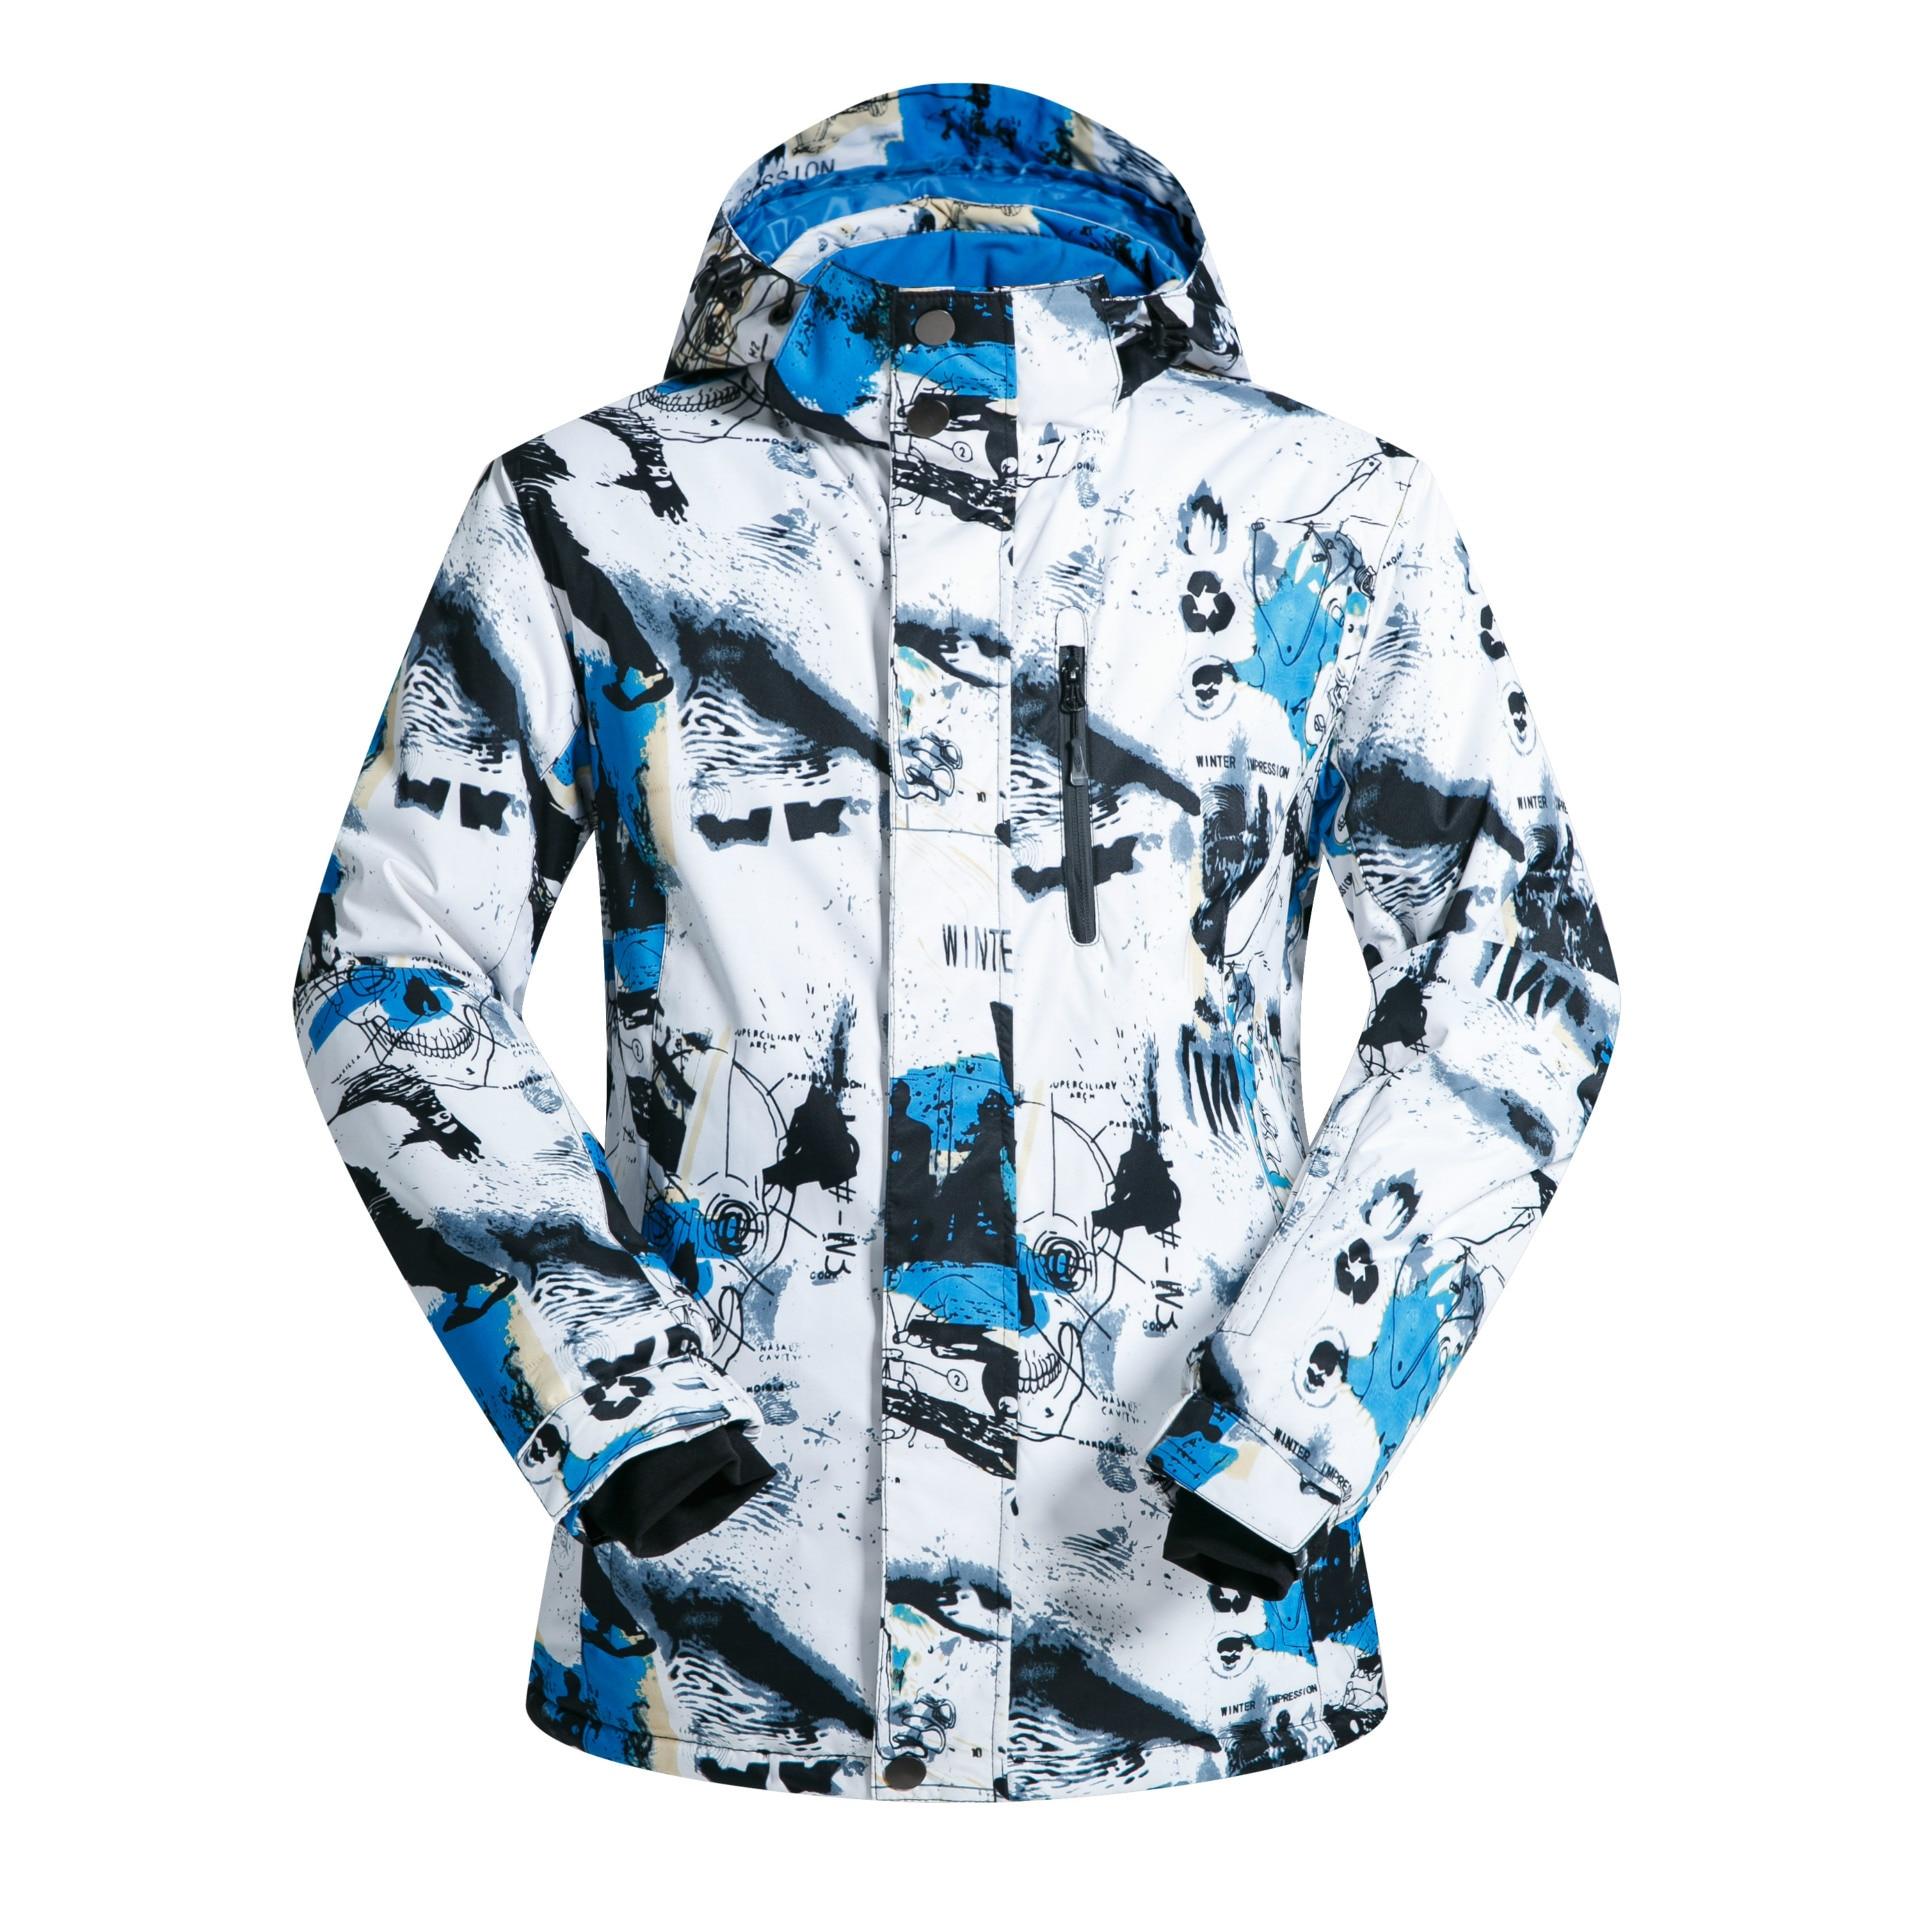 New Outdoor Ski Suit Men's Windproof Waterproof Thermal Snowboard Snow Male Skiing Jacket Skiwear Skating Clothes multicolor недорго, оригинальная цена